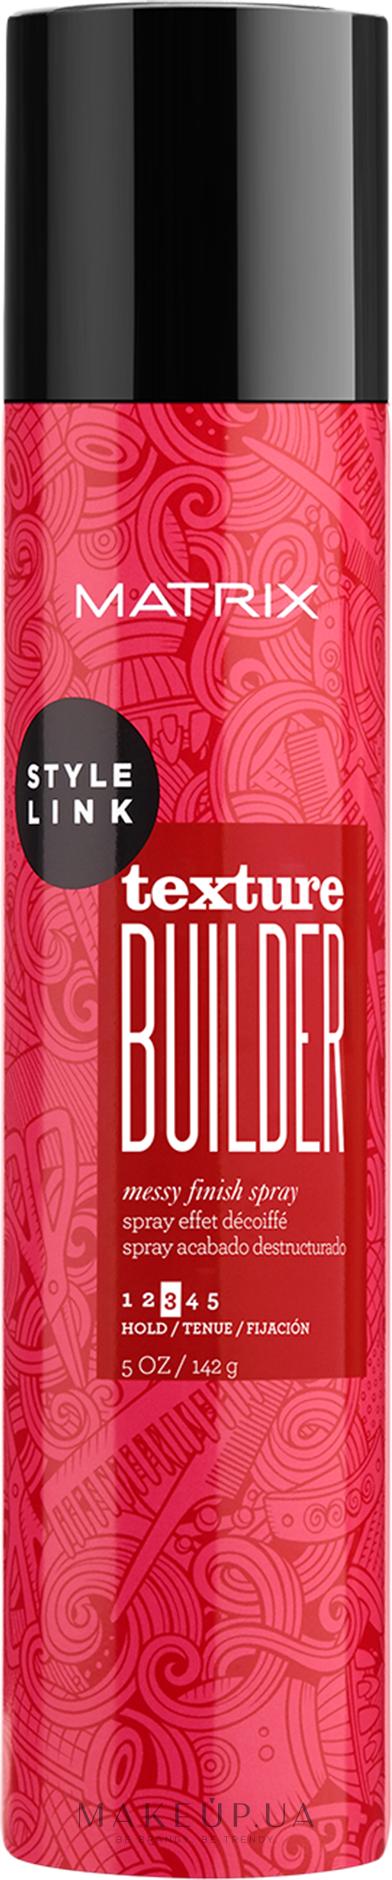 Текстурирующий спрей - Matrix Style Link Texture Builder Volumen — фото 150ml